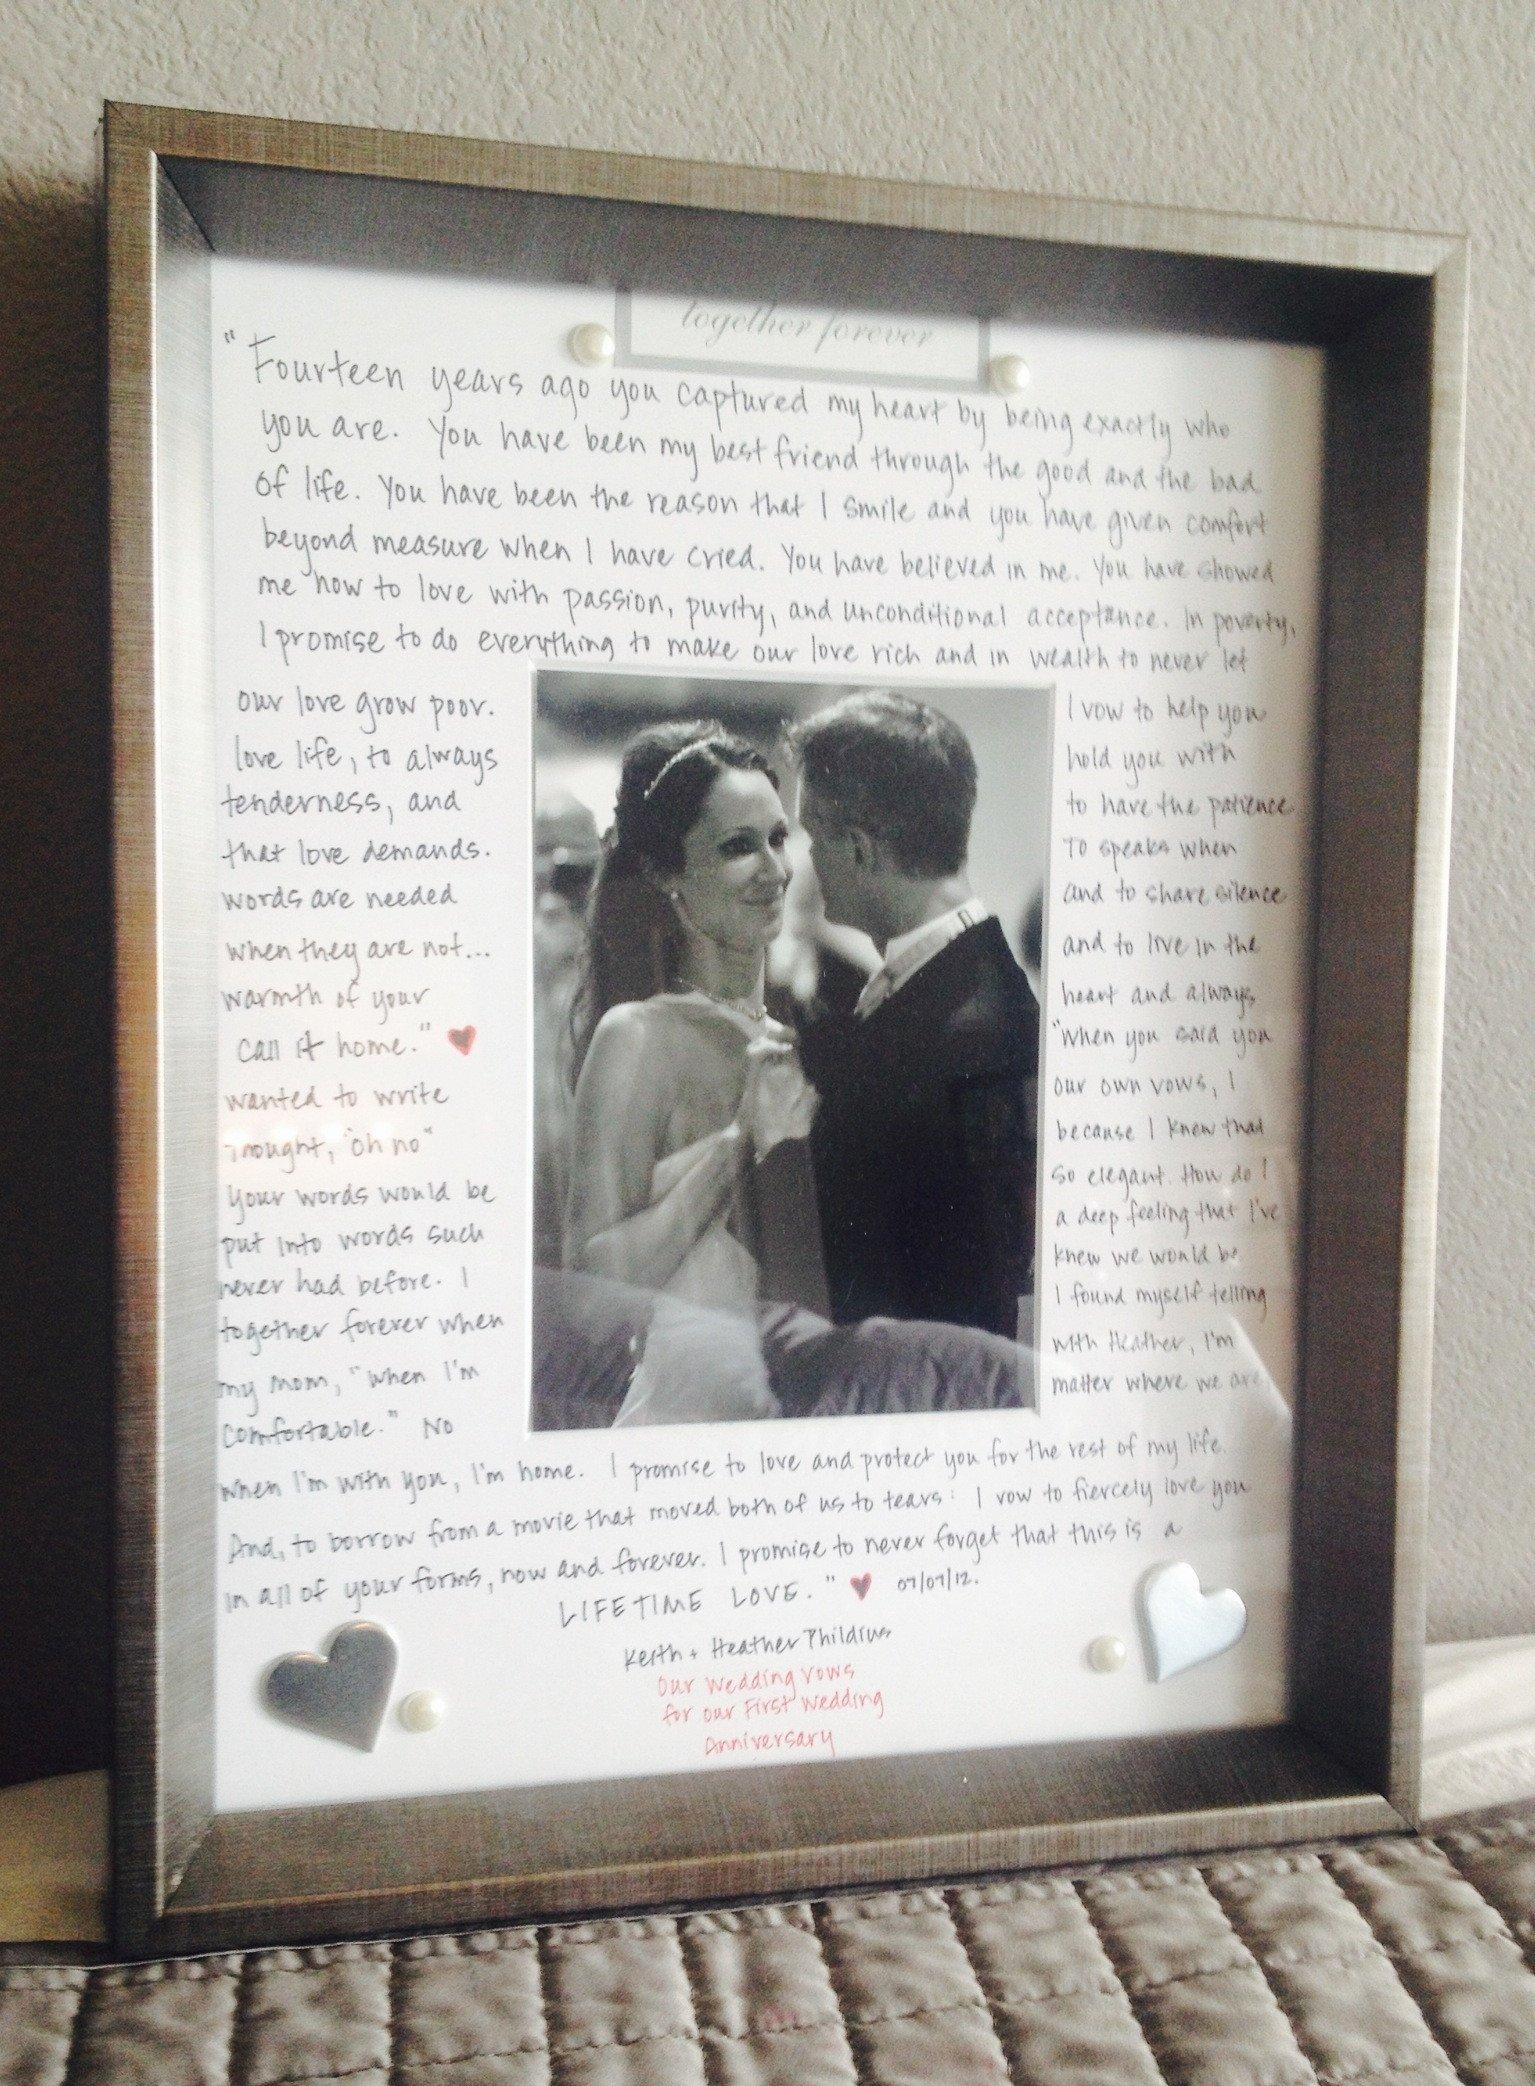 10 Amazing Gift Ideas For First Wedding Anniversary awesome first year wedding anniversary gifts for husband ideas 1 2020